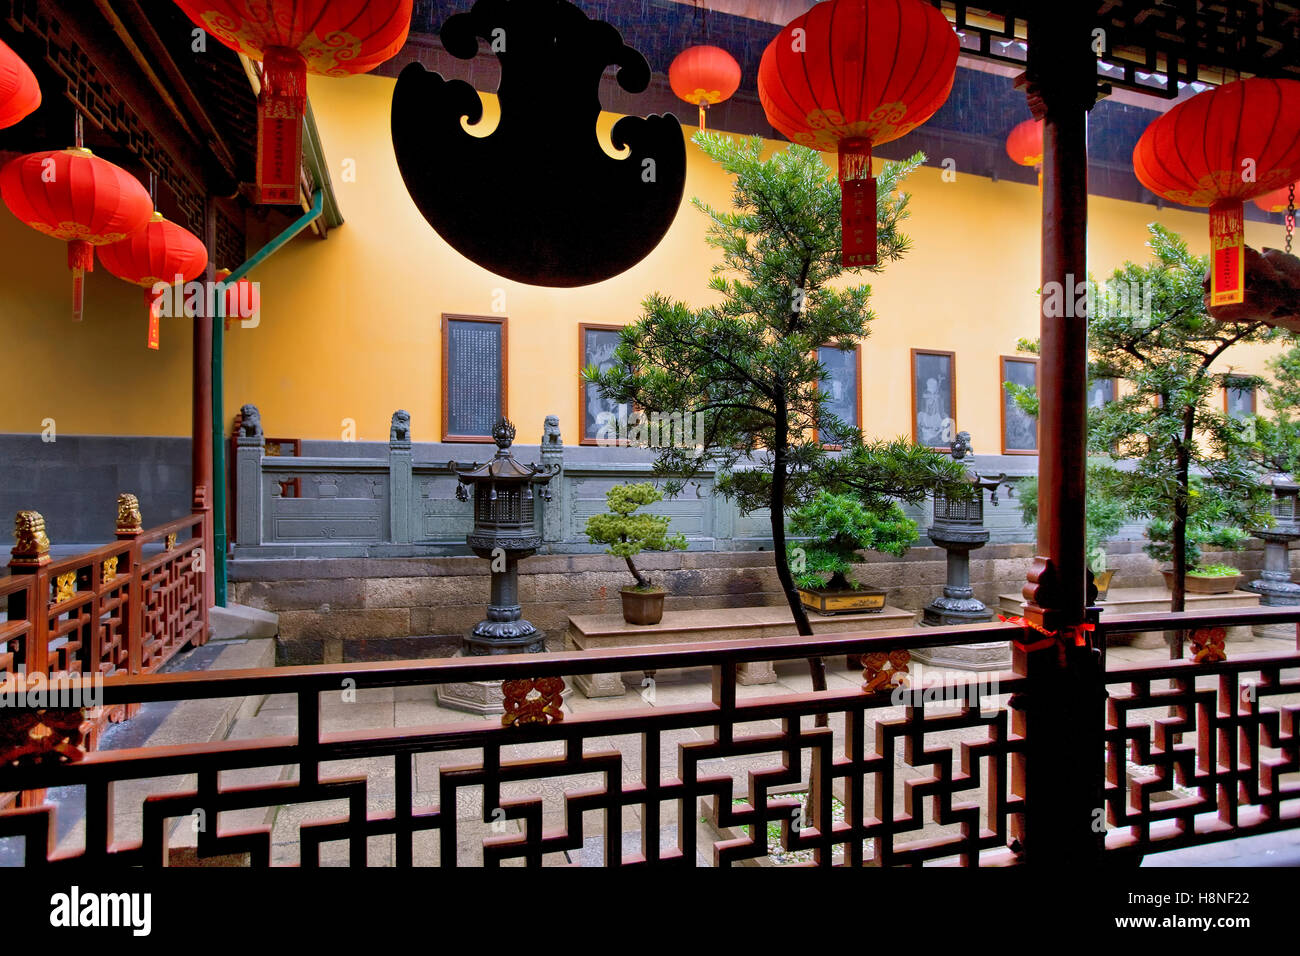 Jade temple in Shanghai - Stock Image